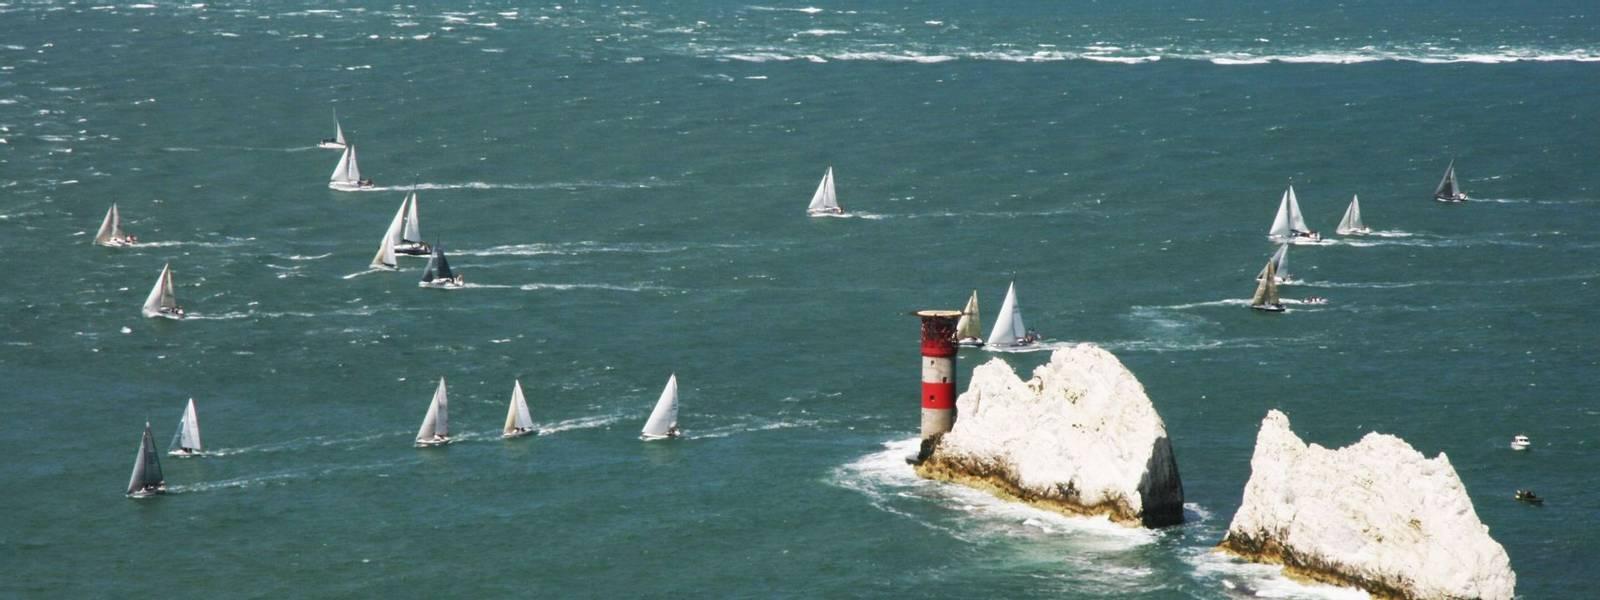 Isle_of_Wight_Needles_Yacht_Race.jpg